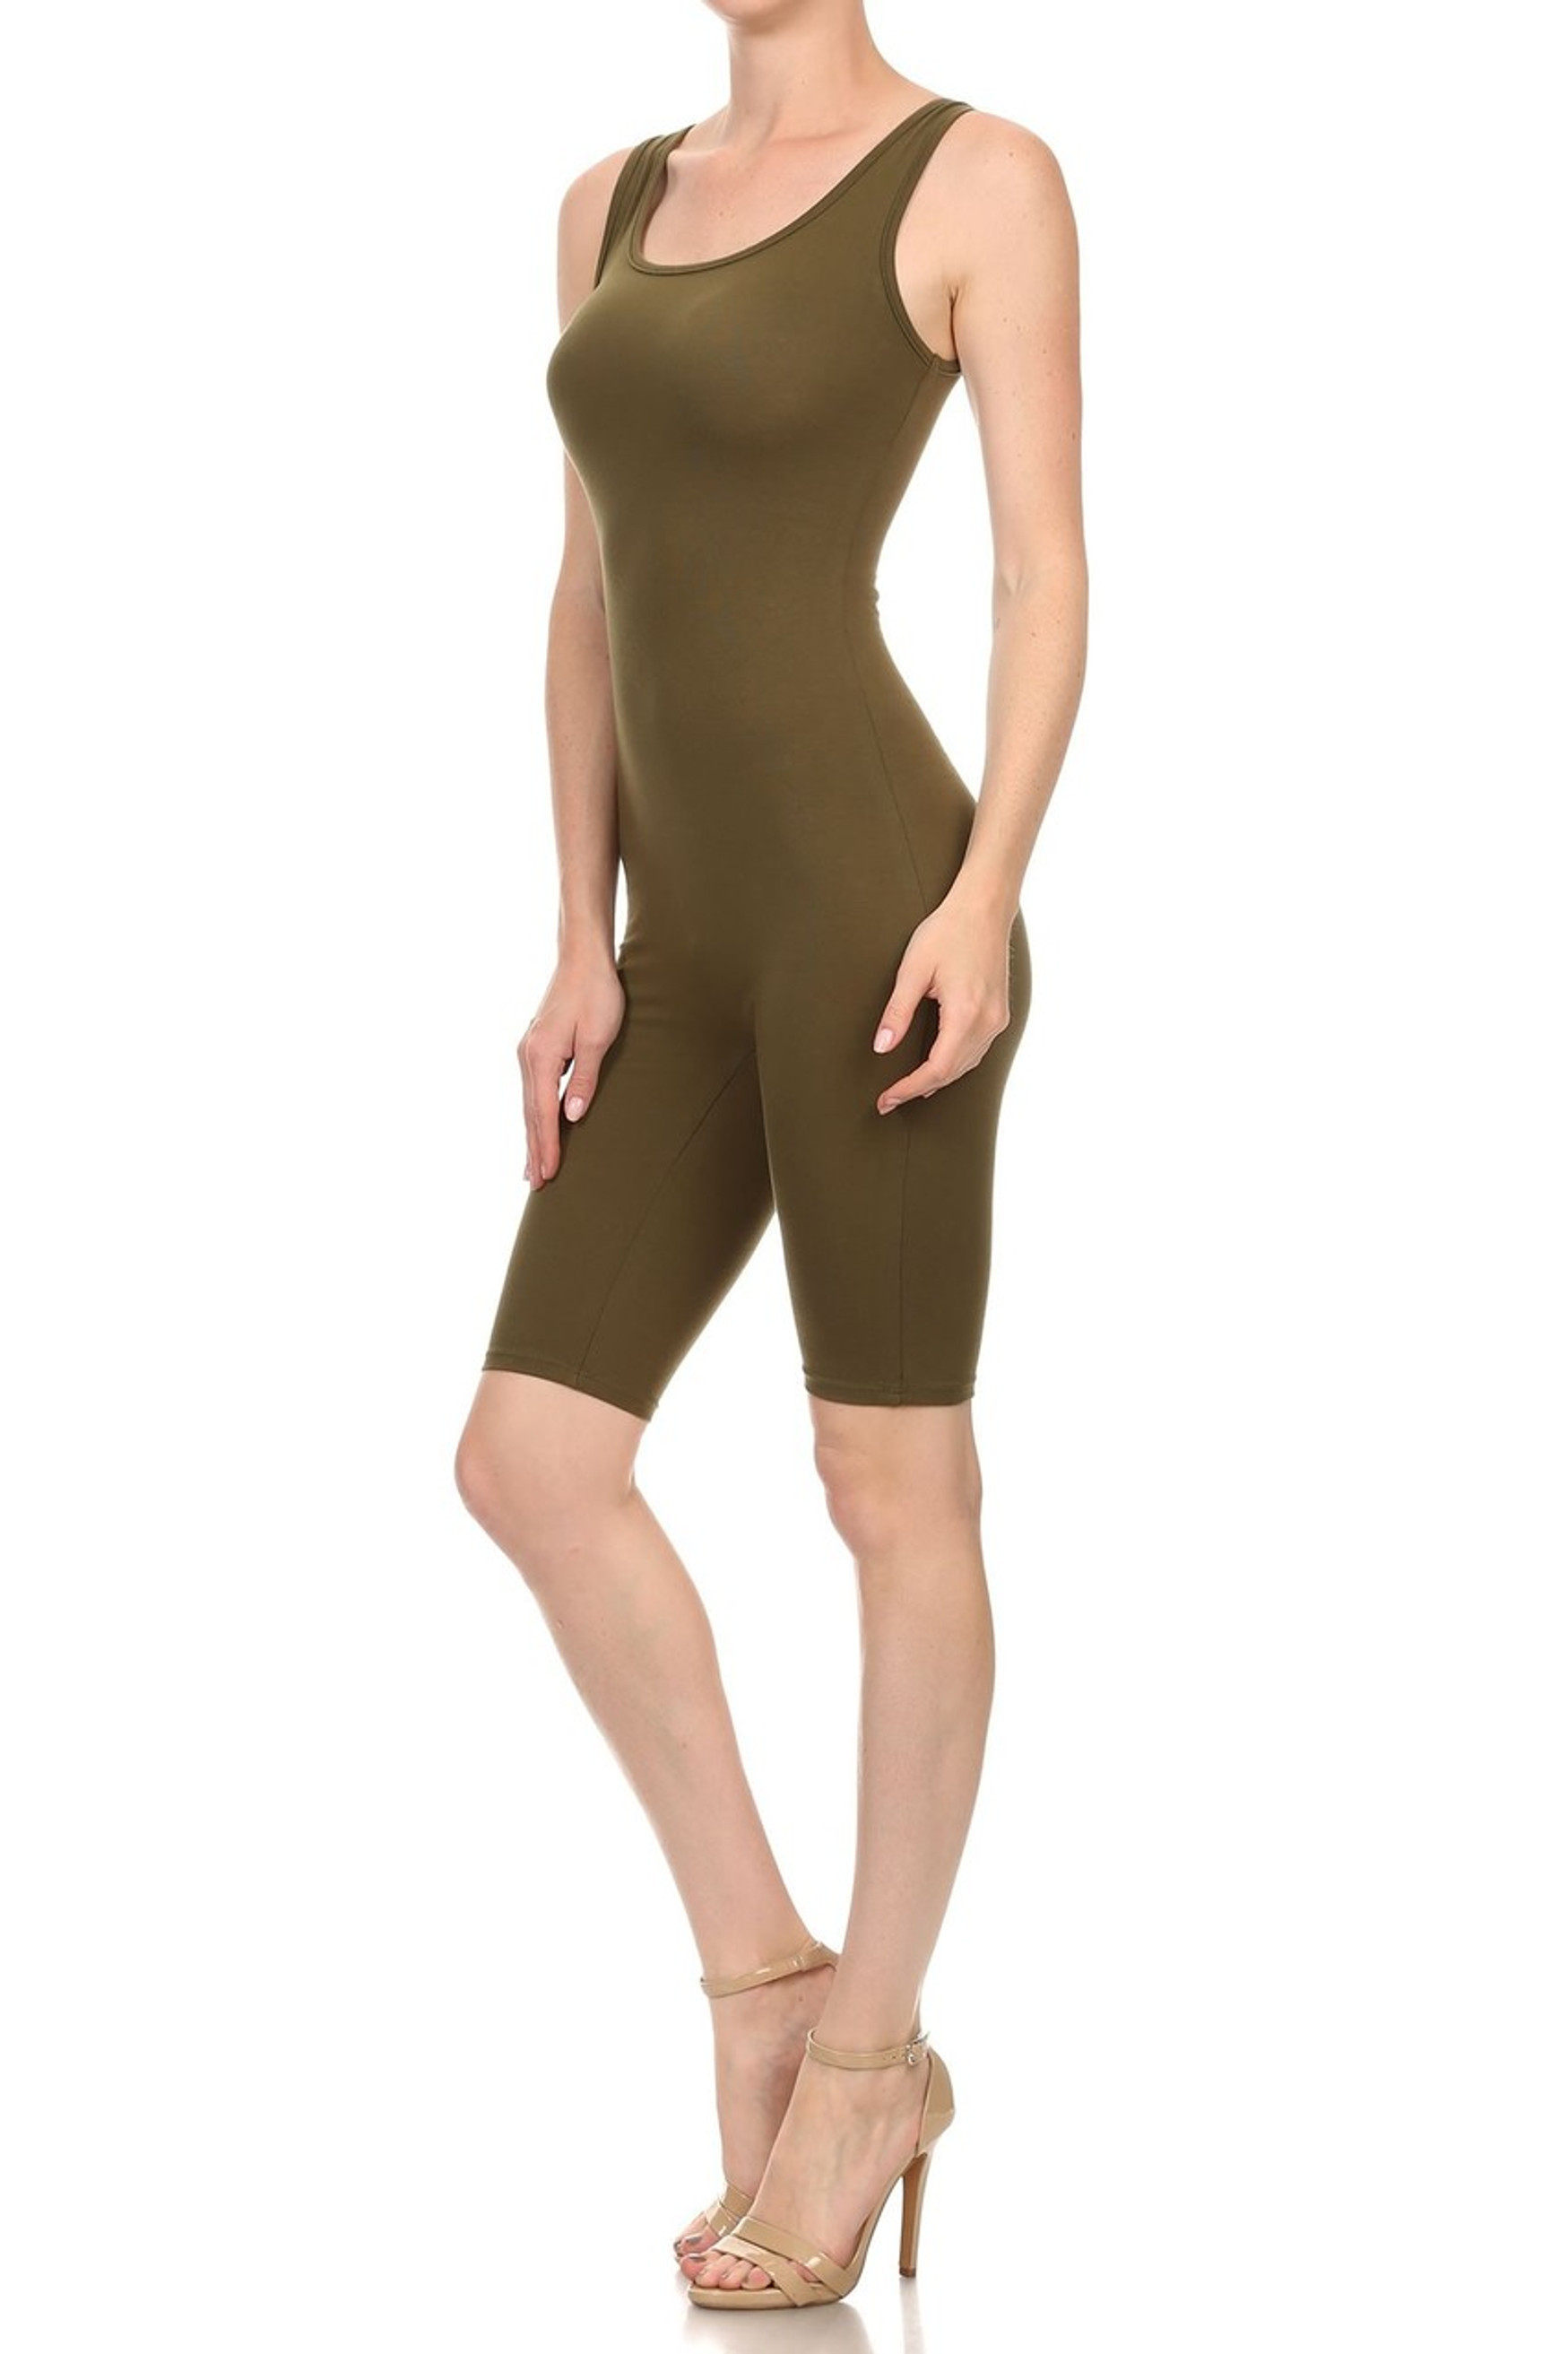 Olive USA Basic Cotton Thigh High Jumpsuit